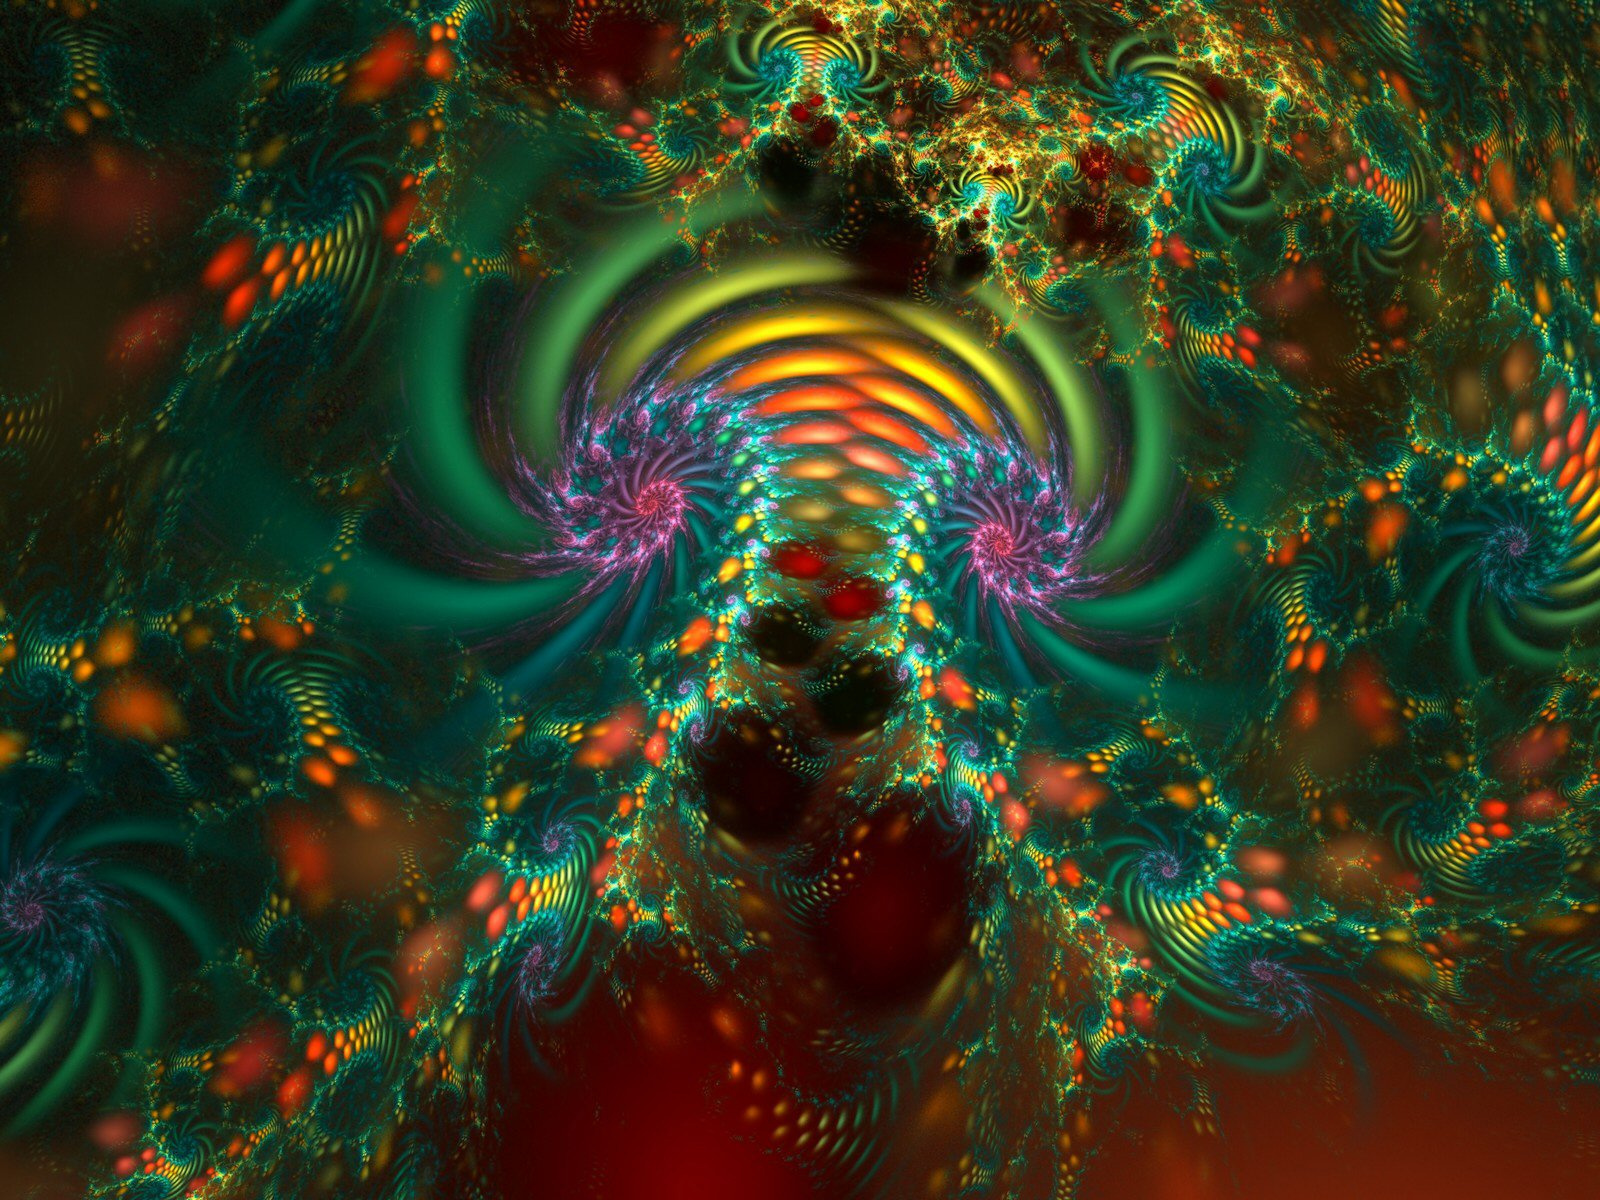 fractal wallpaper background 1600x1200